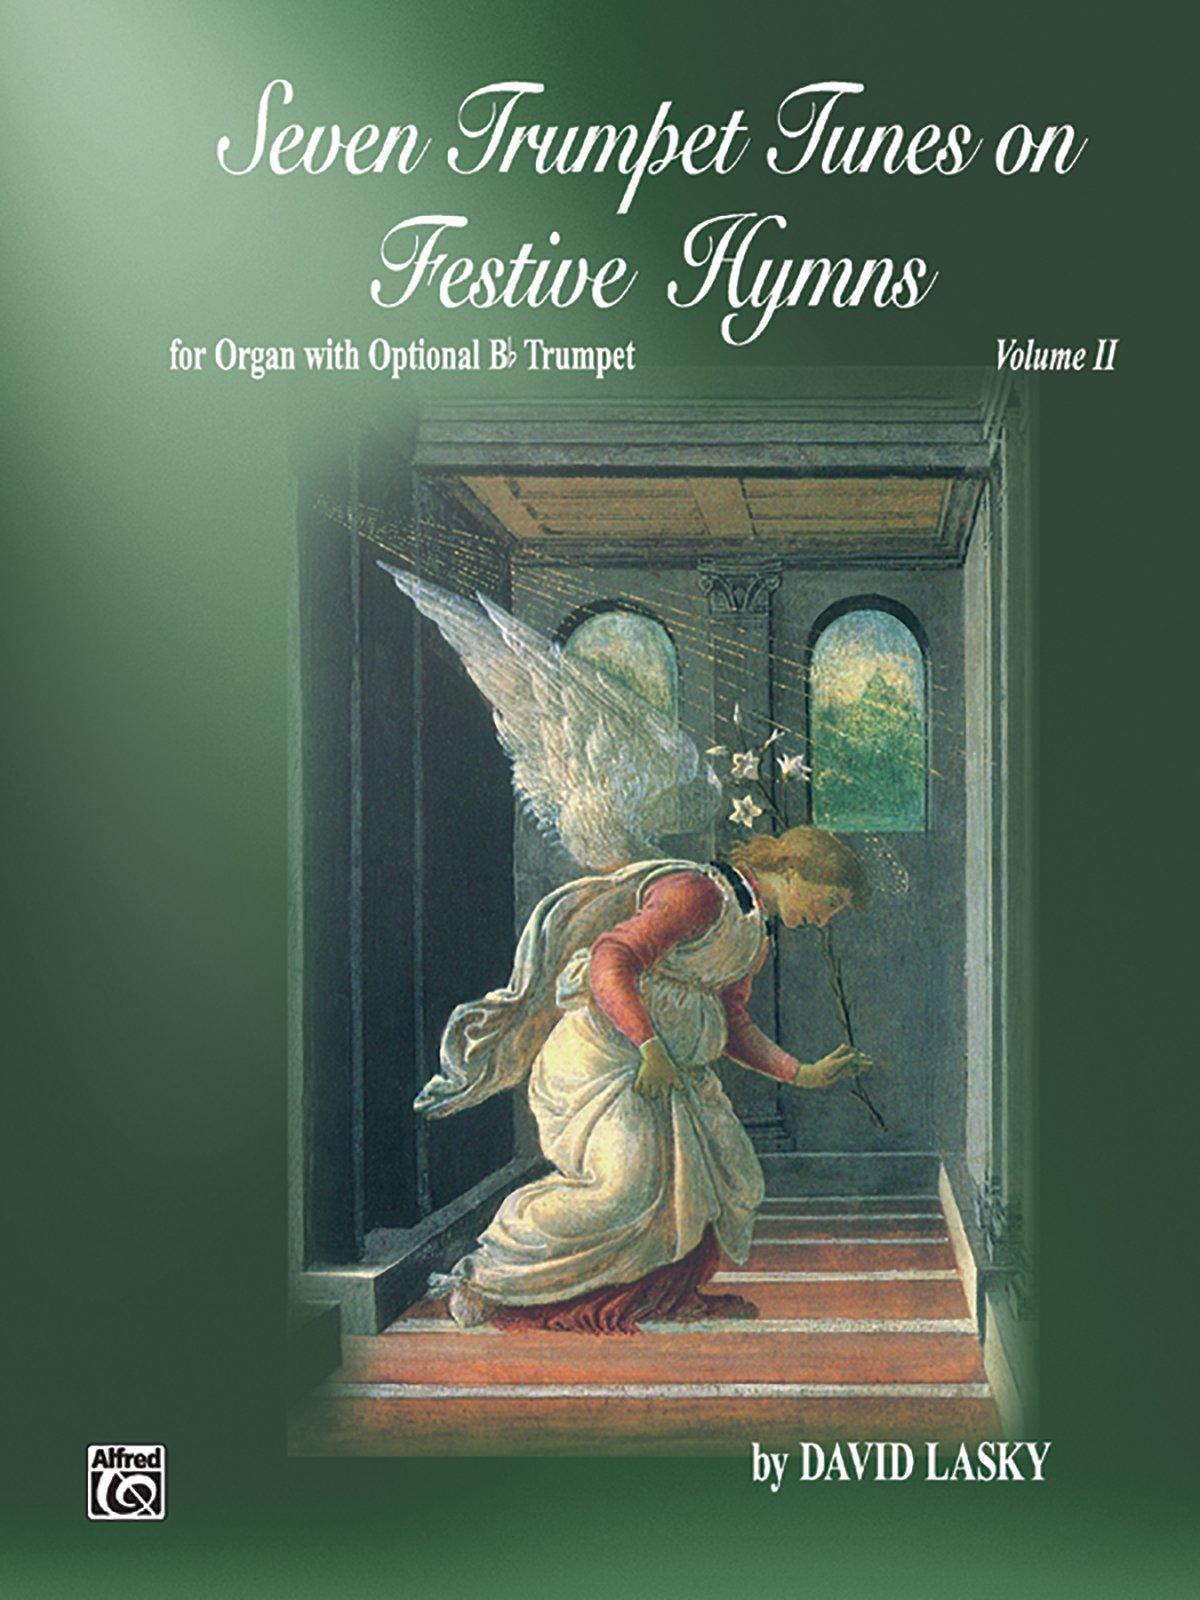 Seven Trumpet Tunes on Festive Hymns (H. W. Gray)